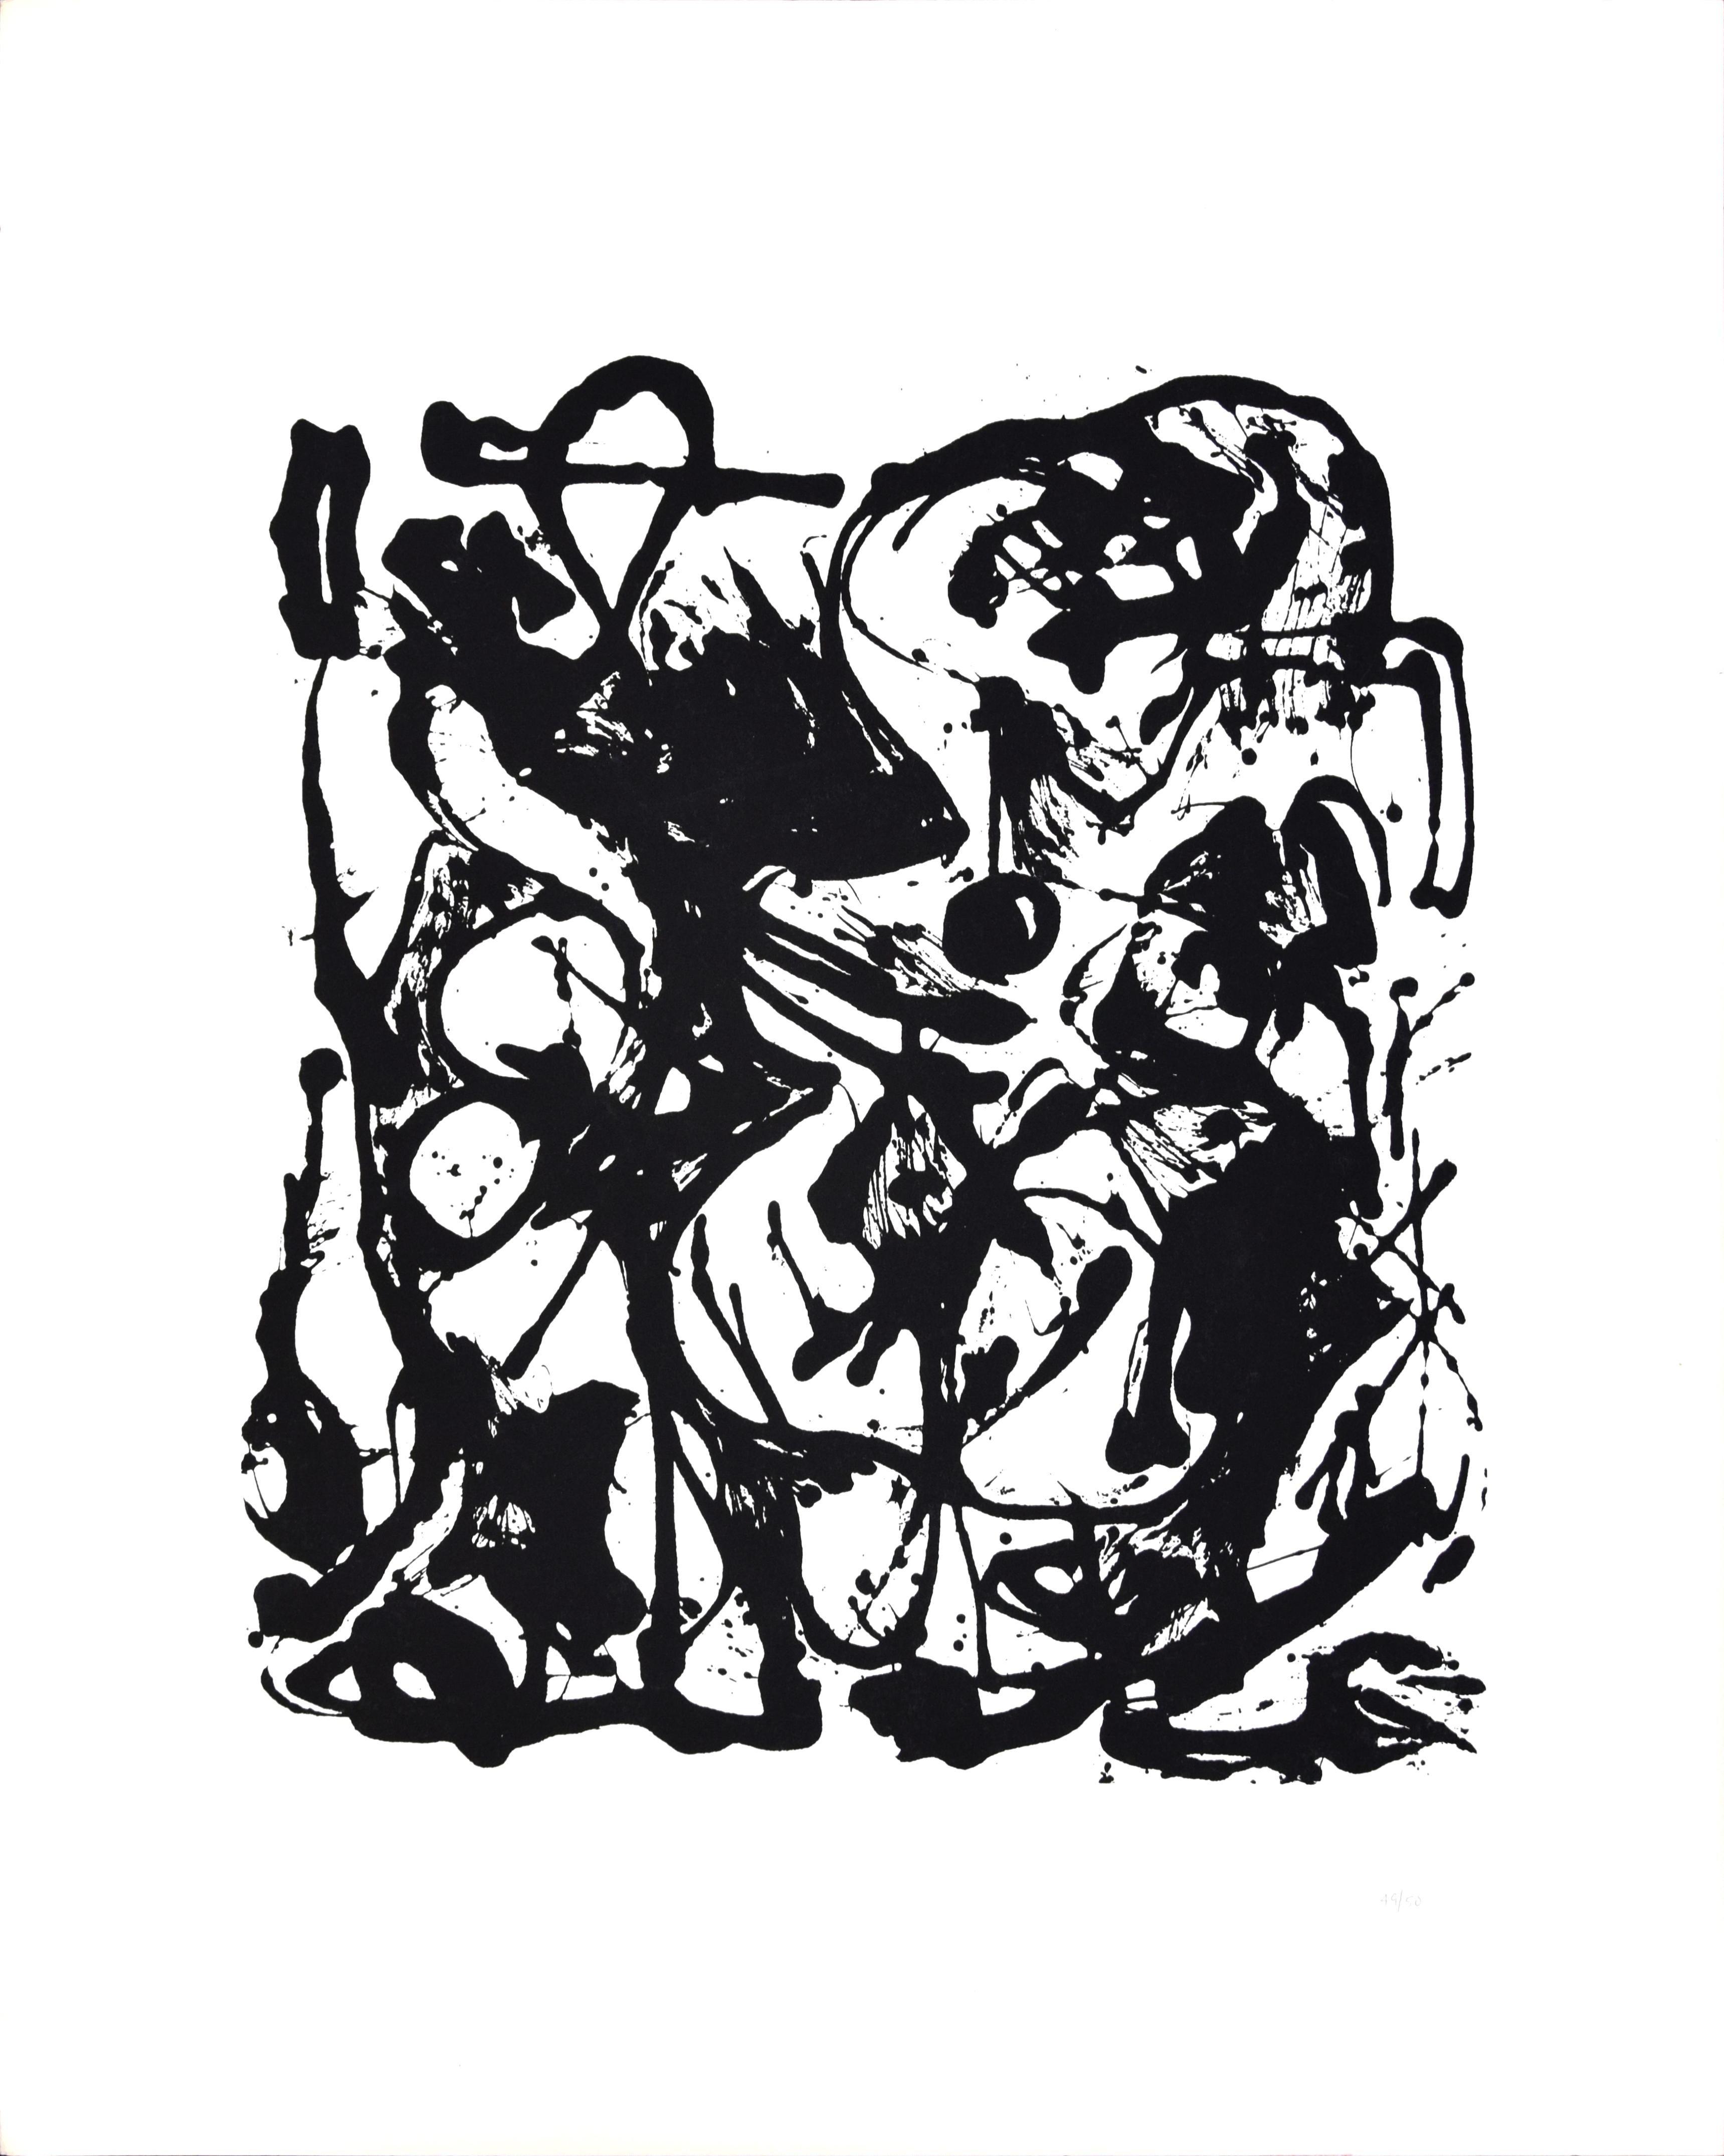 Untitled No. 6 - original screenprint by Jackson Pollock - 1951/64